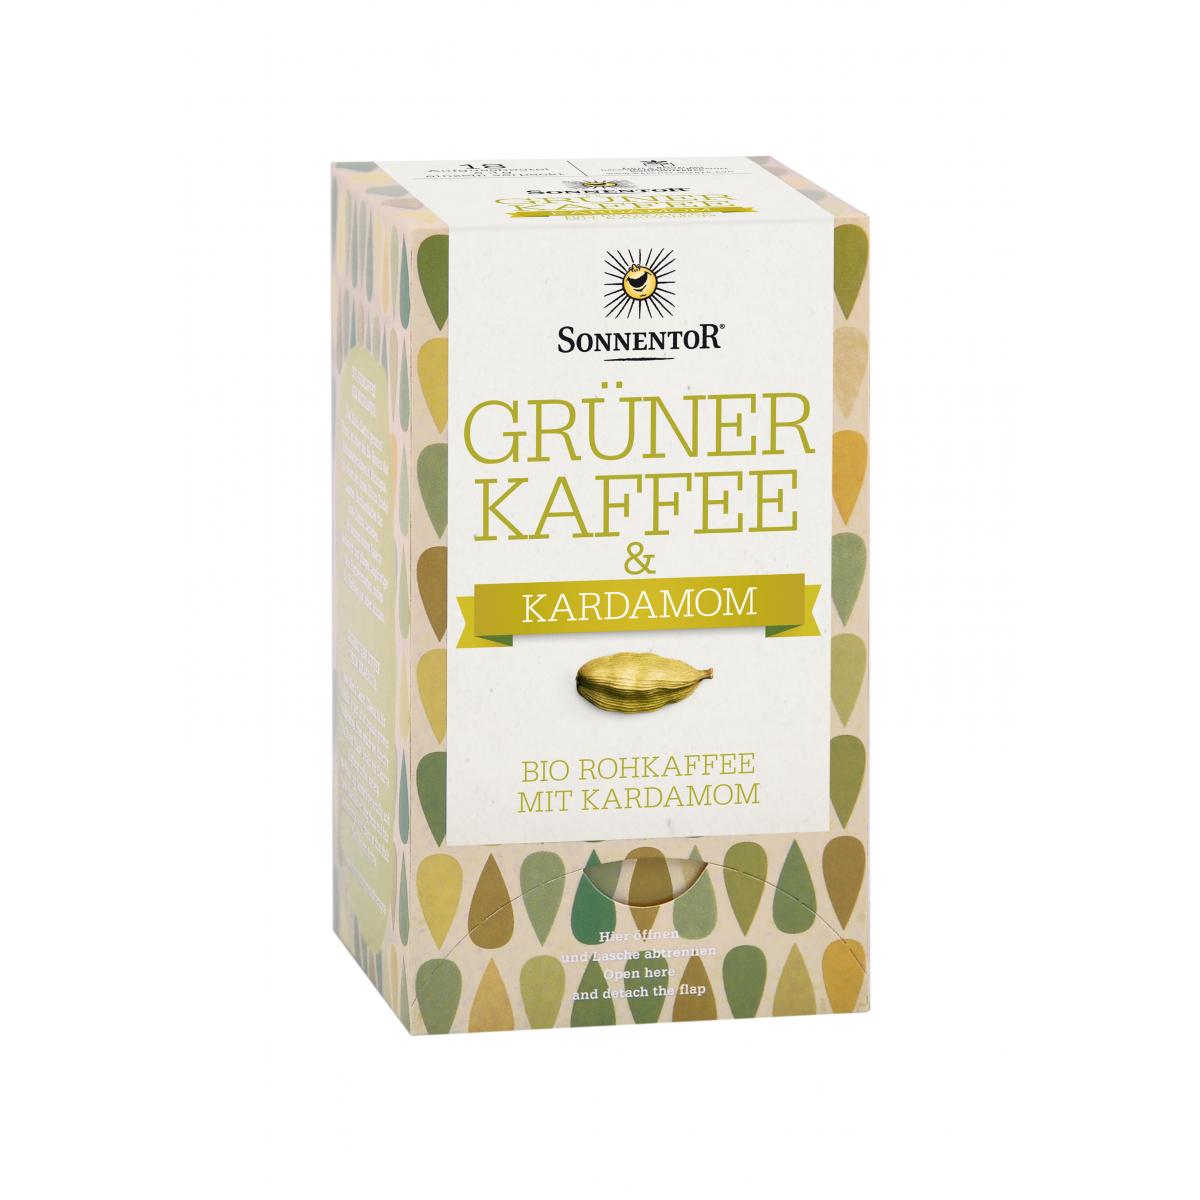 Grüner Kaffee mit Kardamom Sonnentor